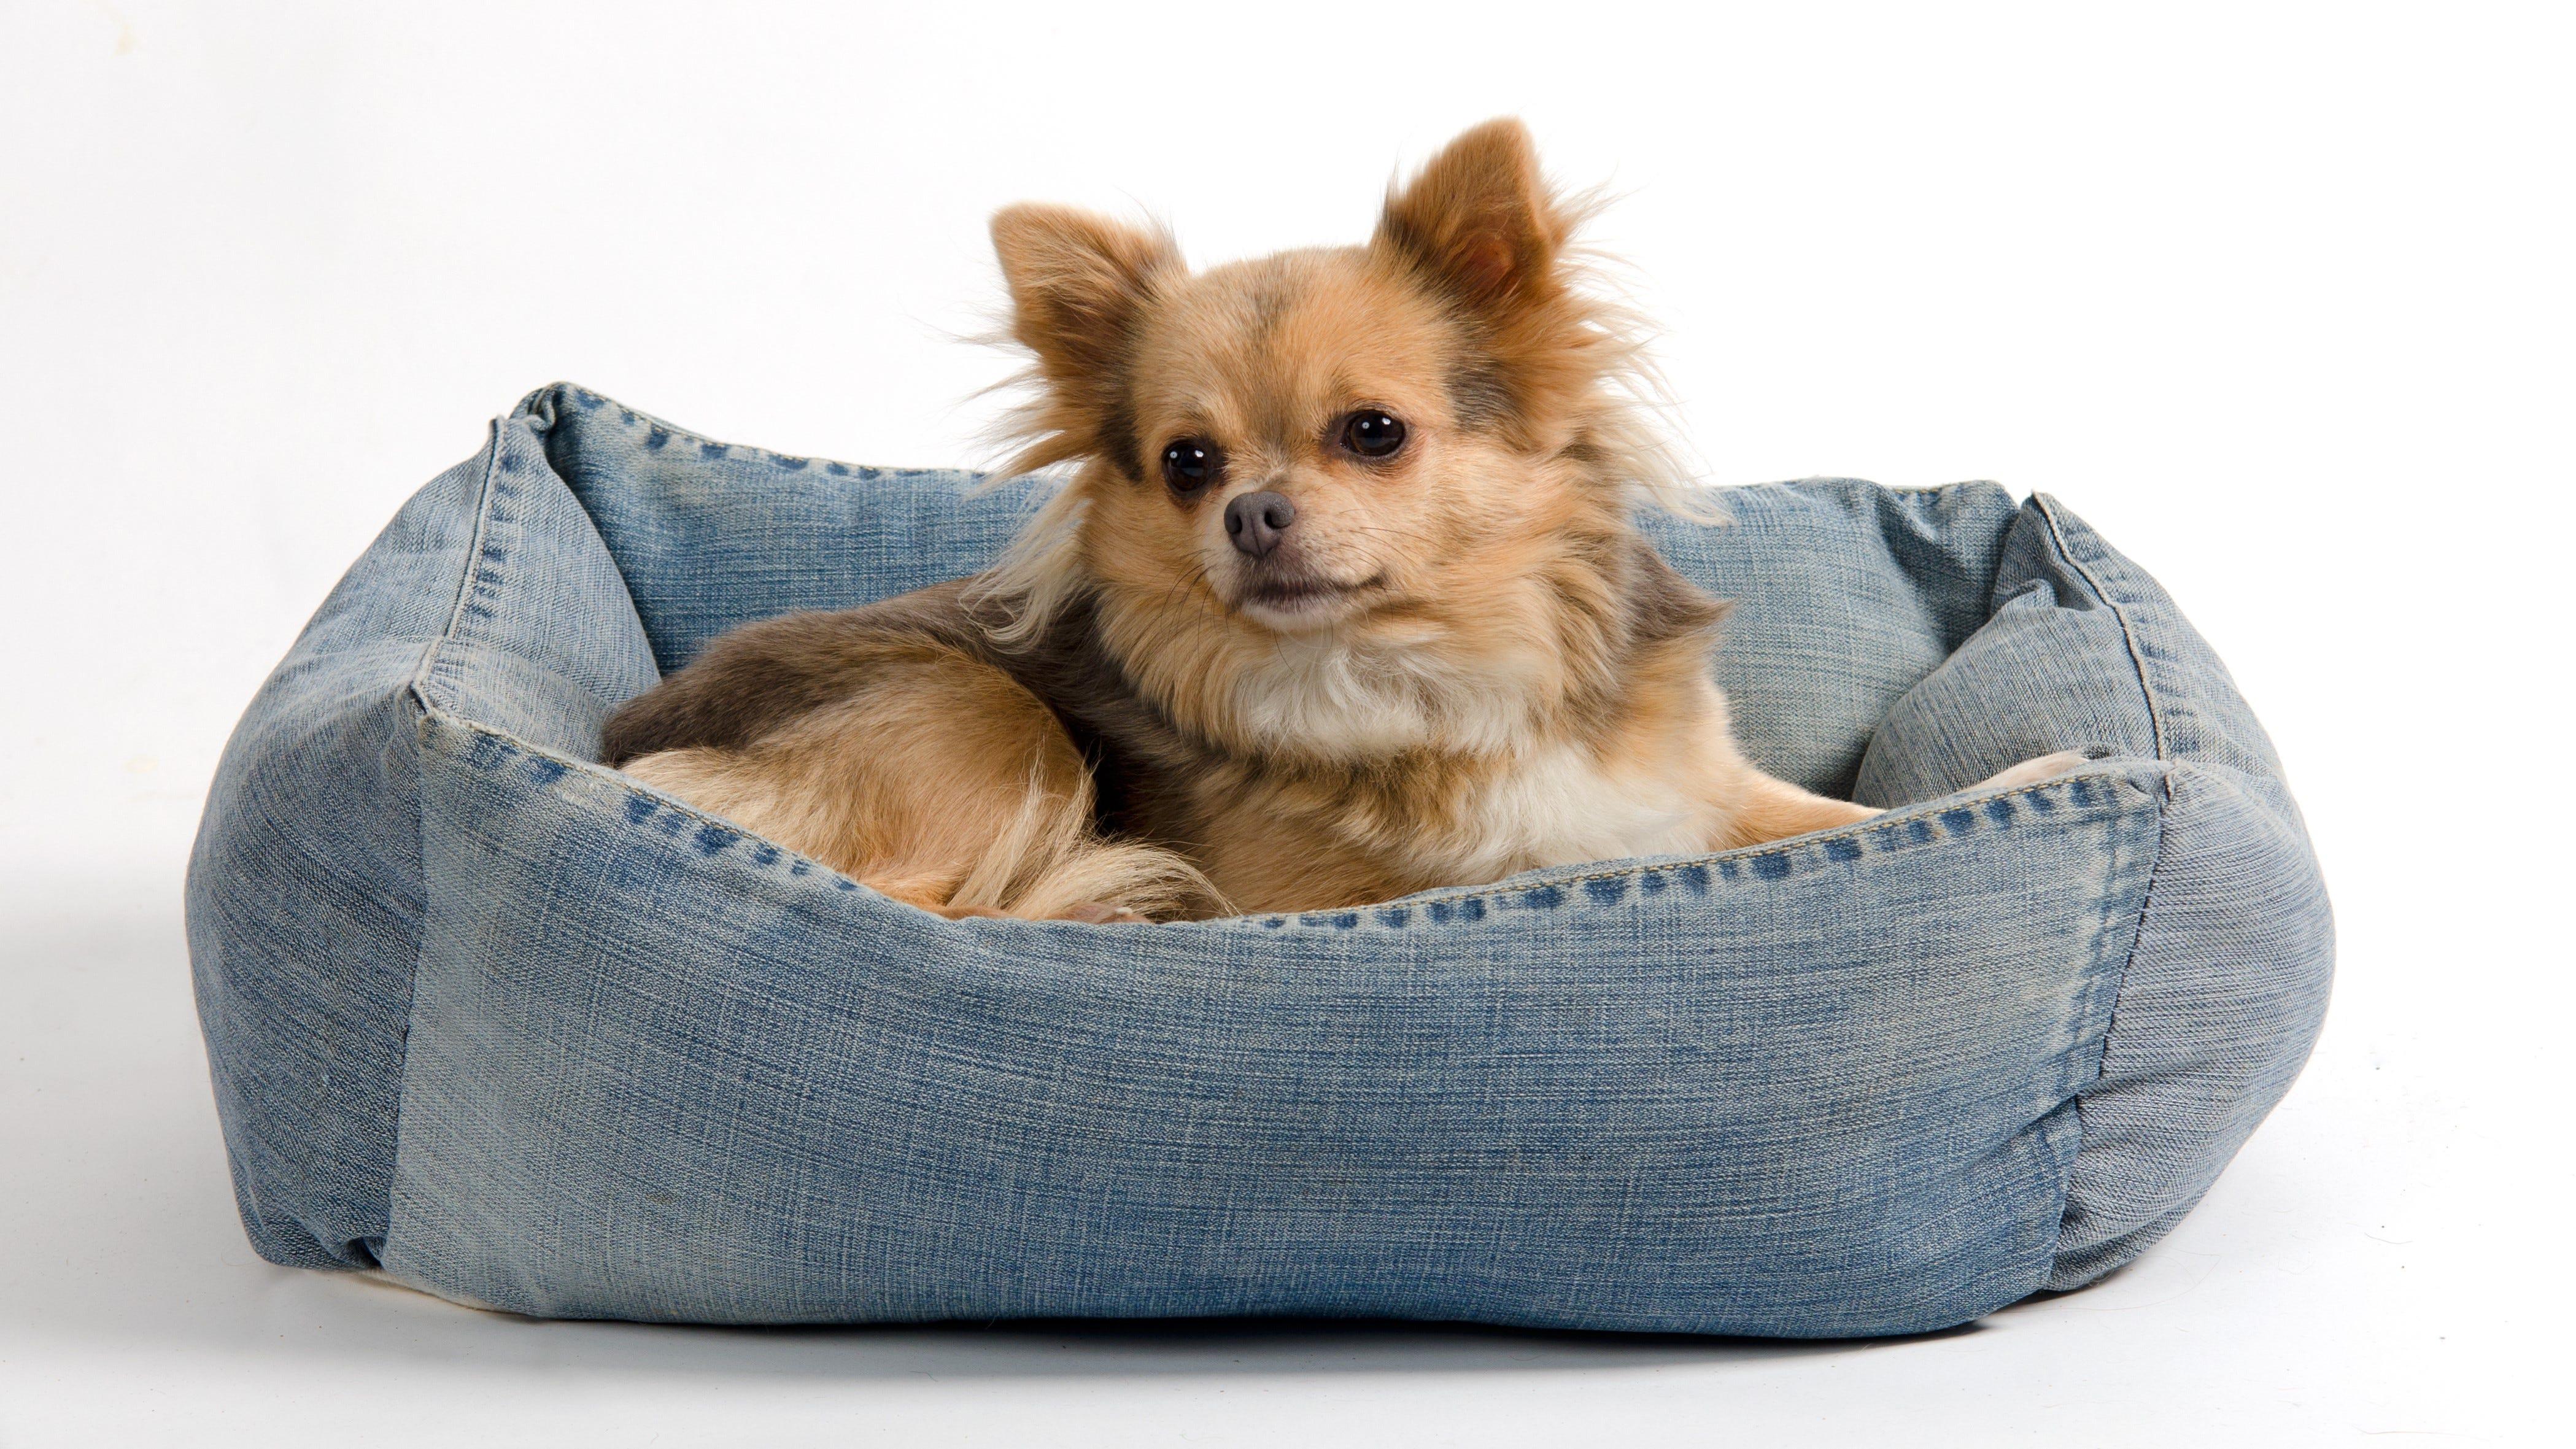 A dog in a denim dog bed.